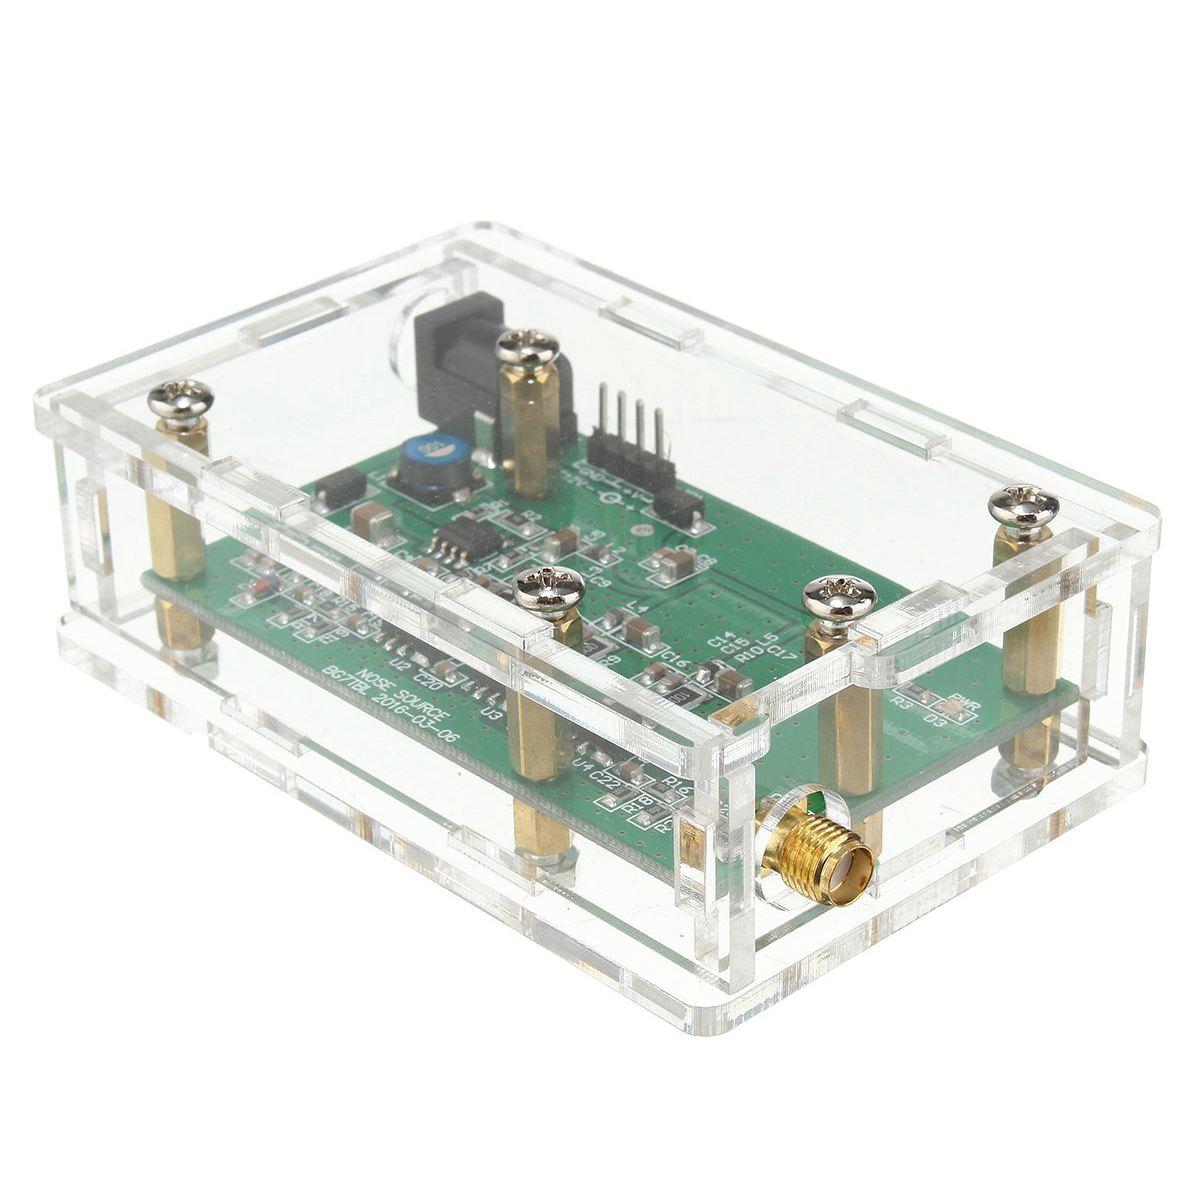 GTBL Noise Source Simple Spectrum External Generator Tracking SMA Source + Case цена 2017